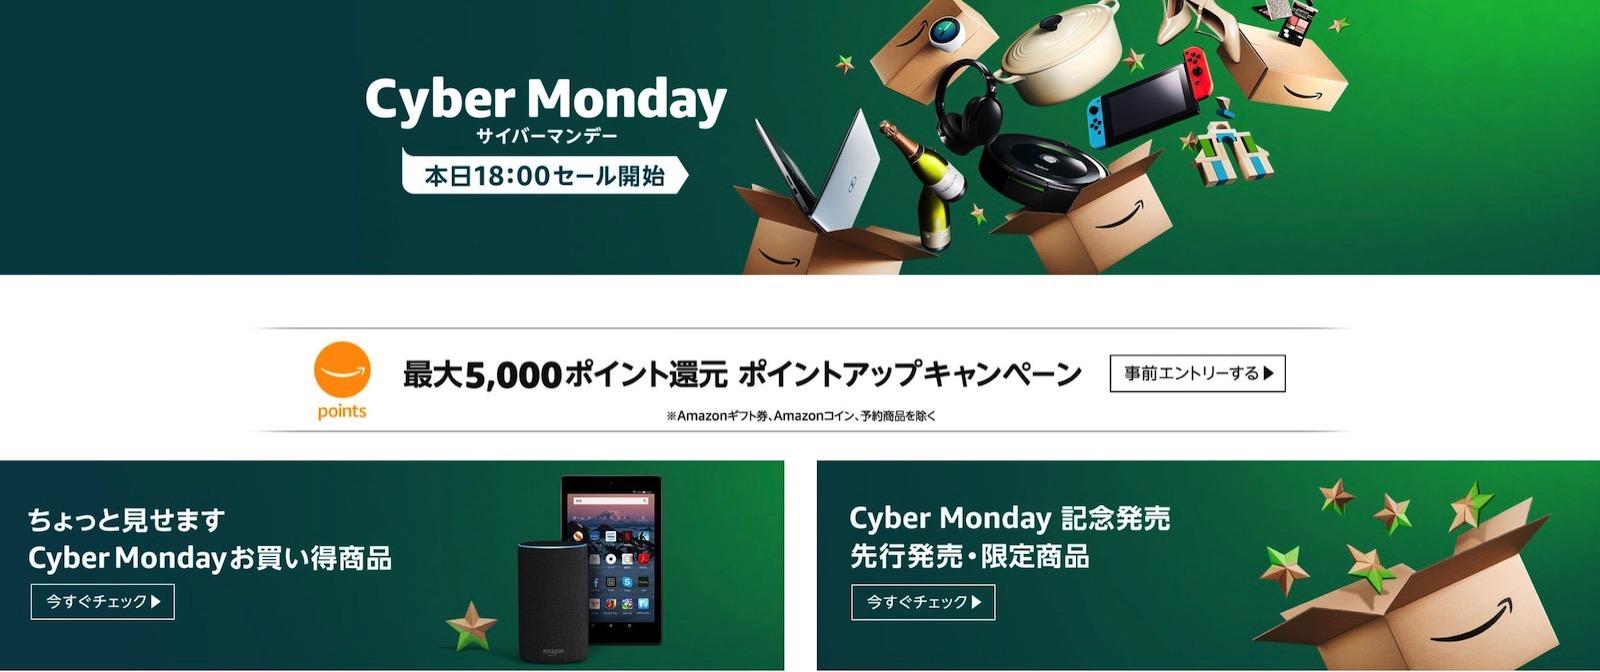 Cyber Monday Sale Start